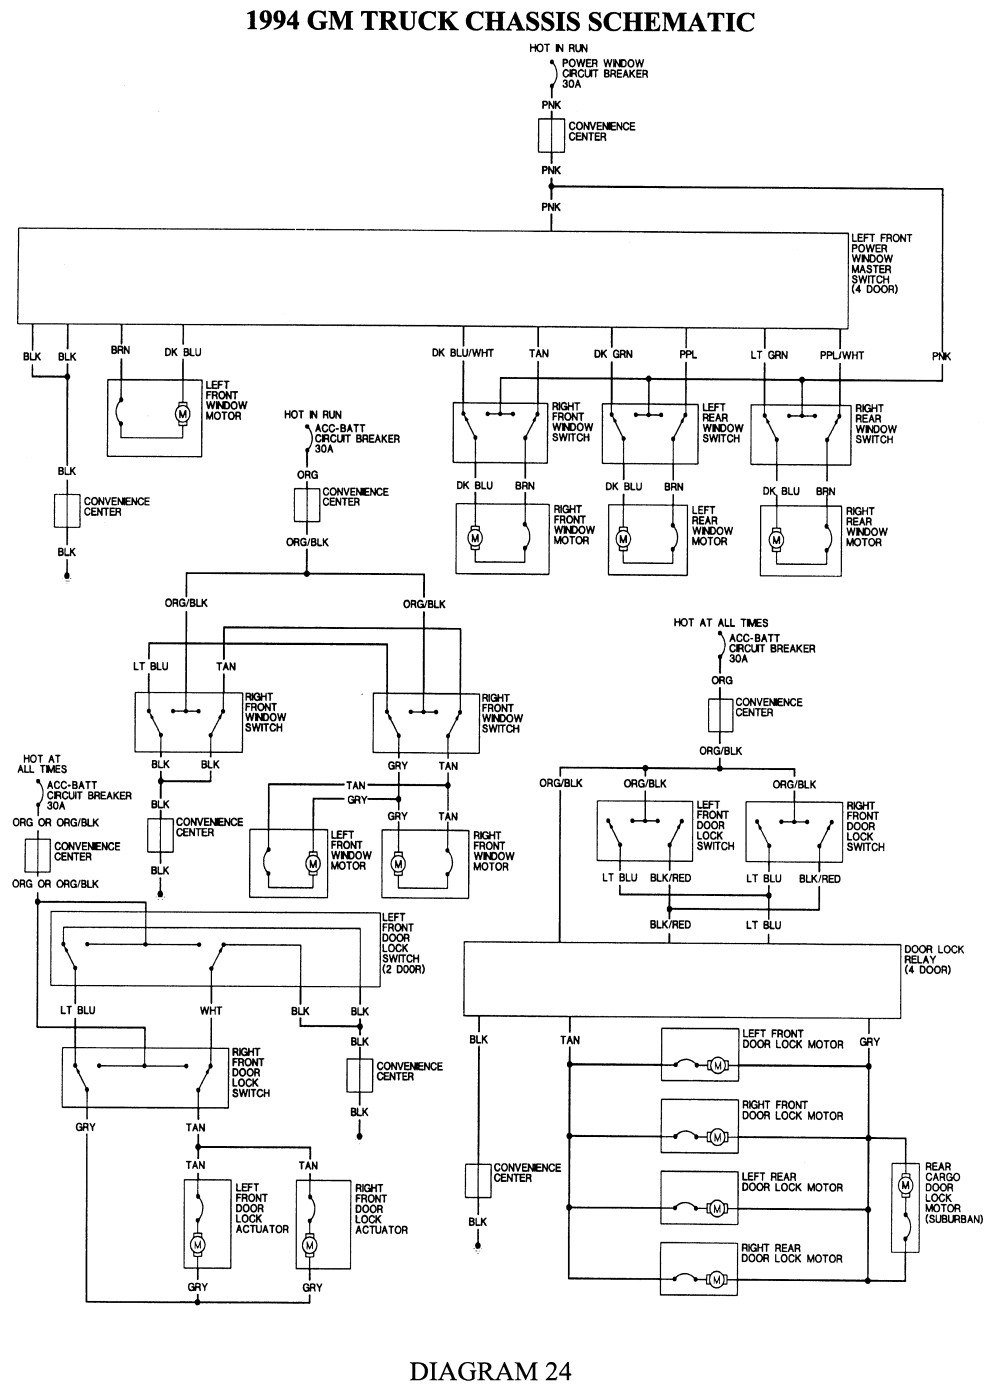 Images 2001 Chevy Suburban Radio Wiring Diagram 9 2002 Trailblazer - Chevy Radio Wiring Diagram